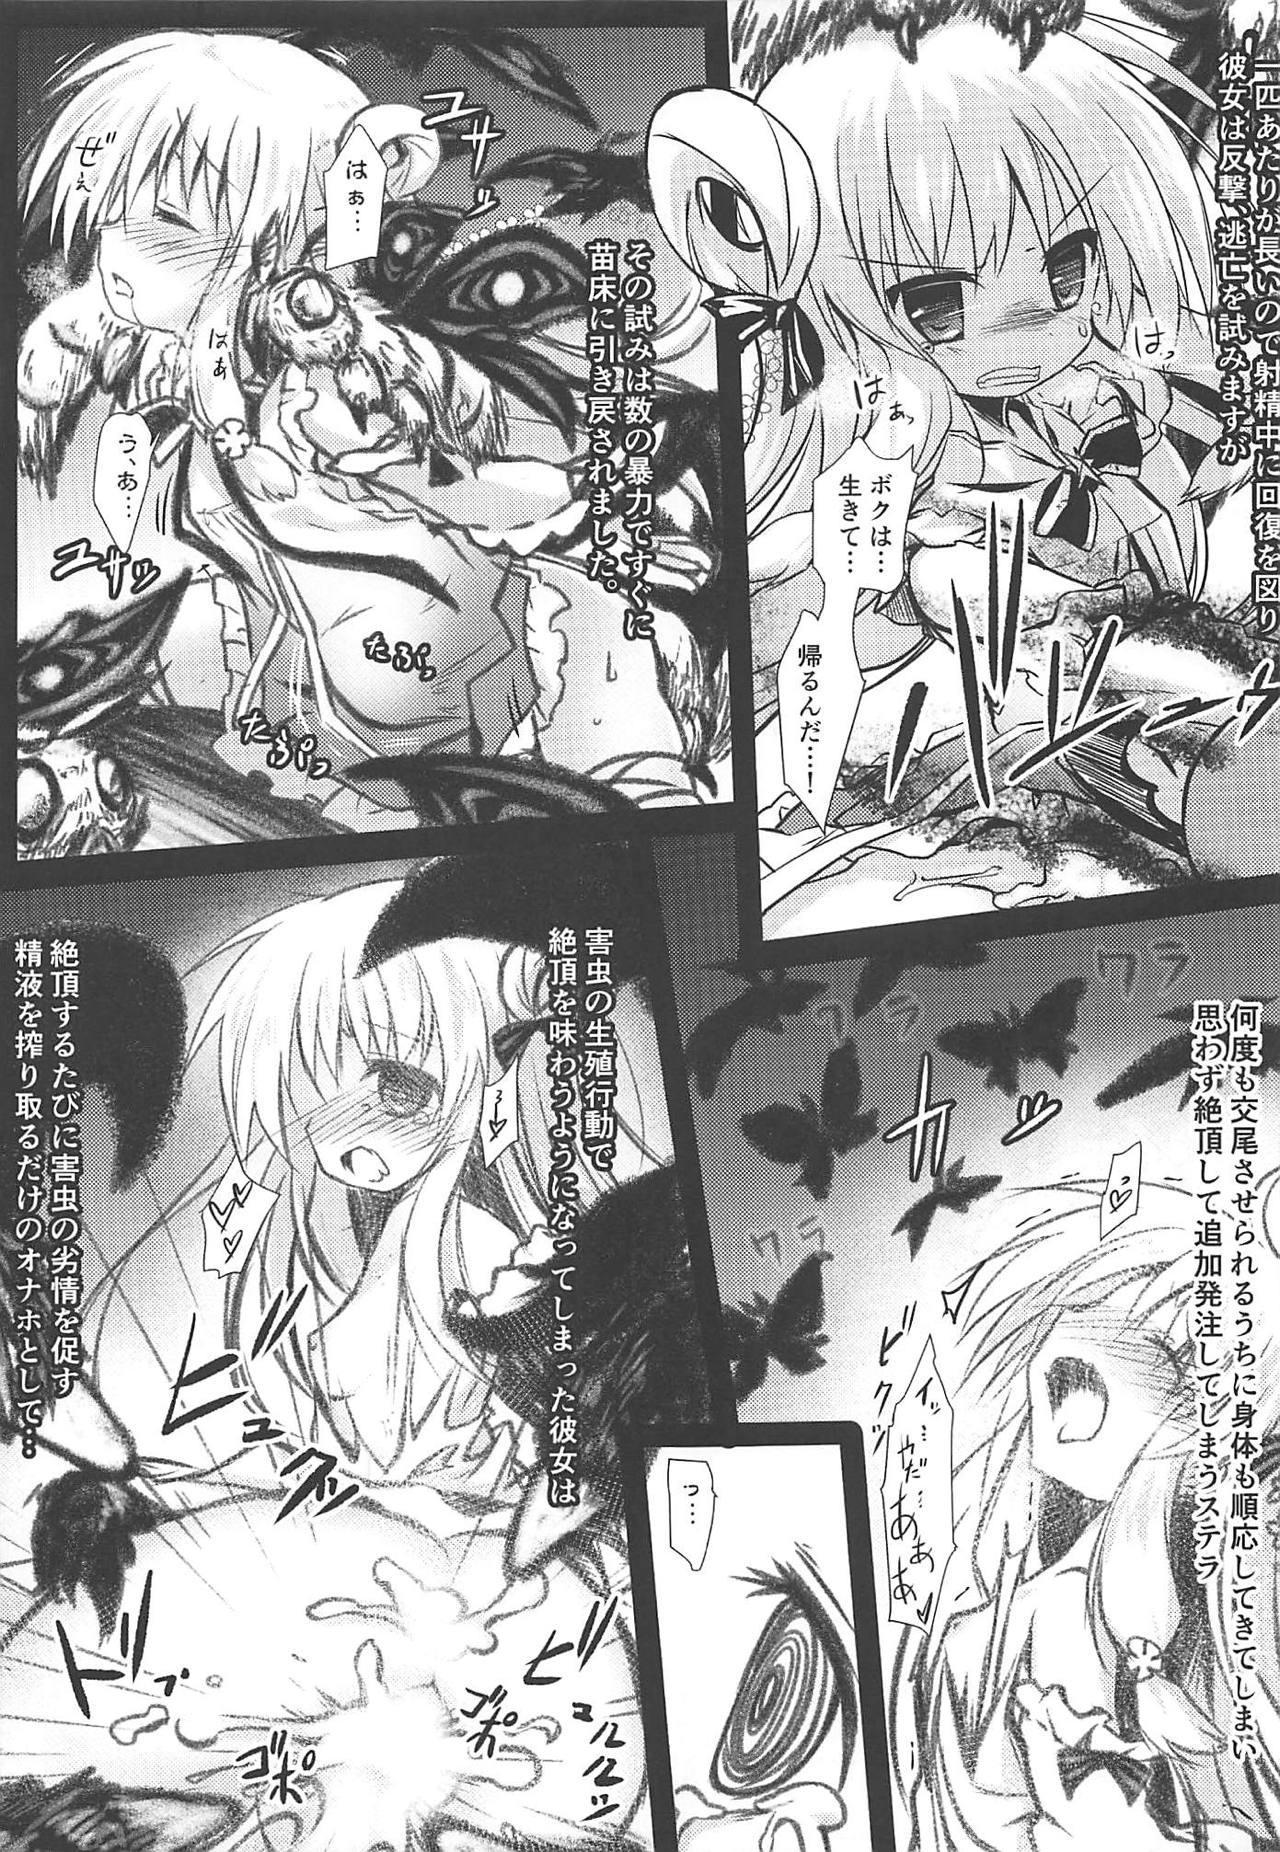 Gaichuu Higai Houkokusho File 3 9